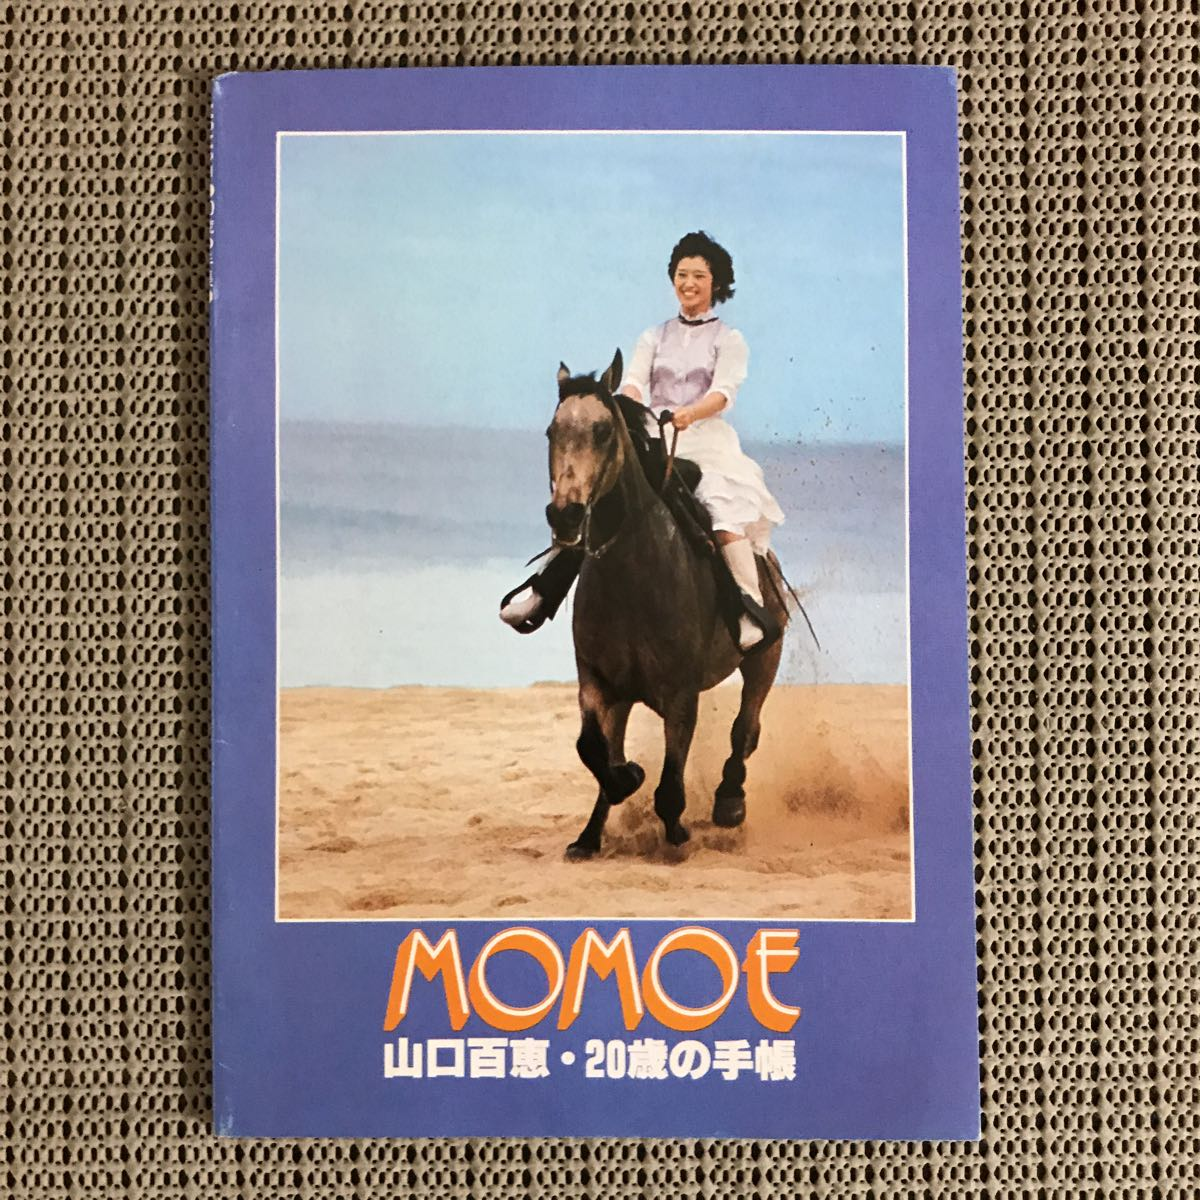 MOMOE 山口百恵・20歳の手帳 近代映画附録/昭和54年5月号 状態良好です_画像2